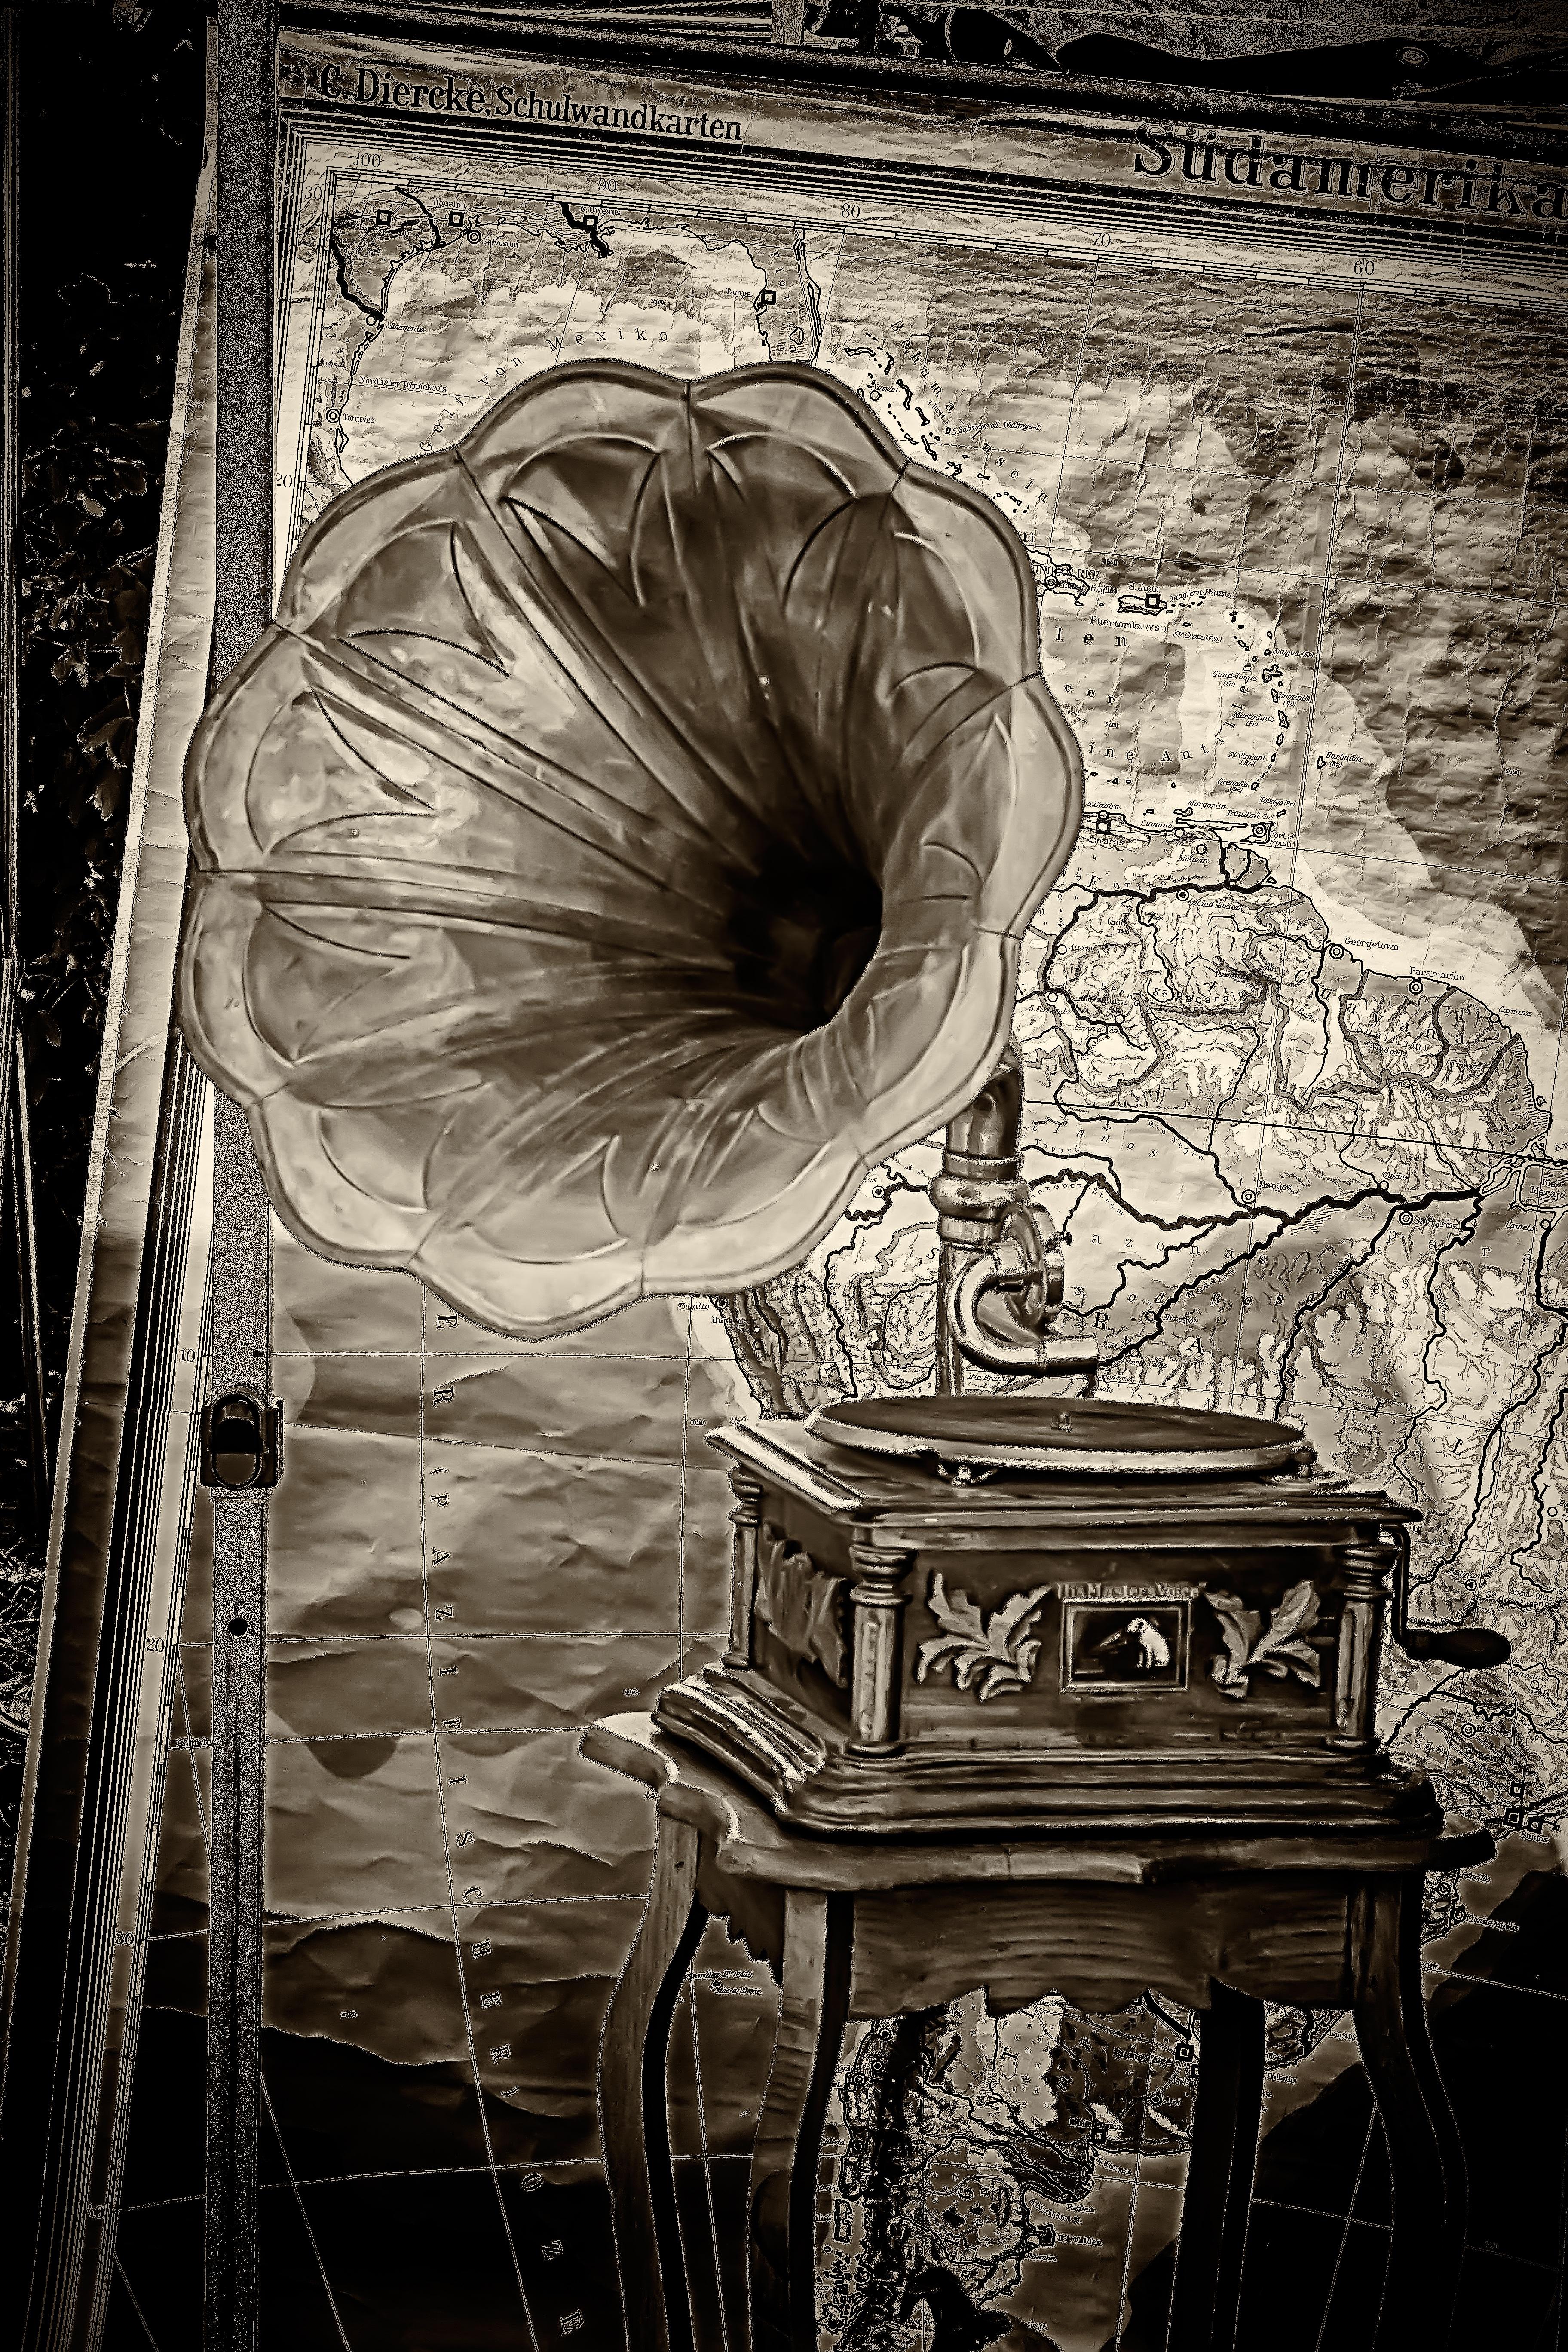 Fotograf Kayit Muzik Siyah Ve Beyaz Eski Nostalji Onemsiz